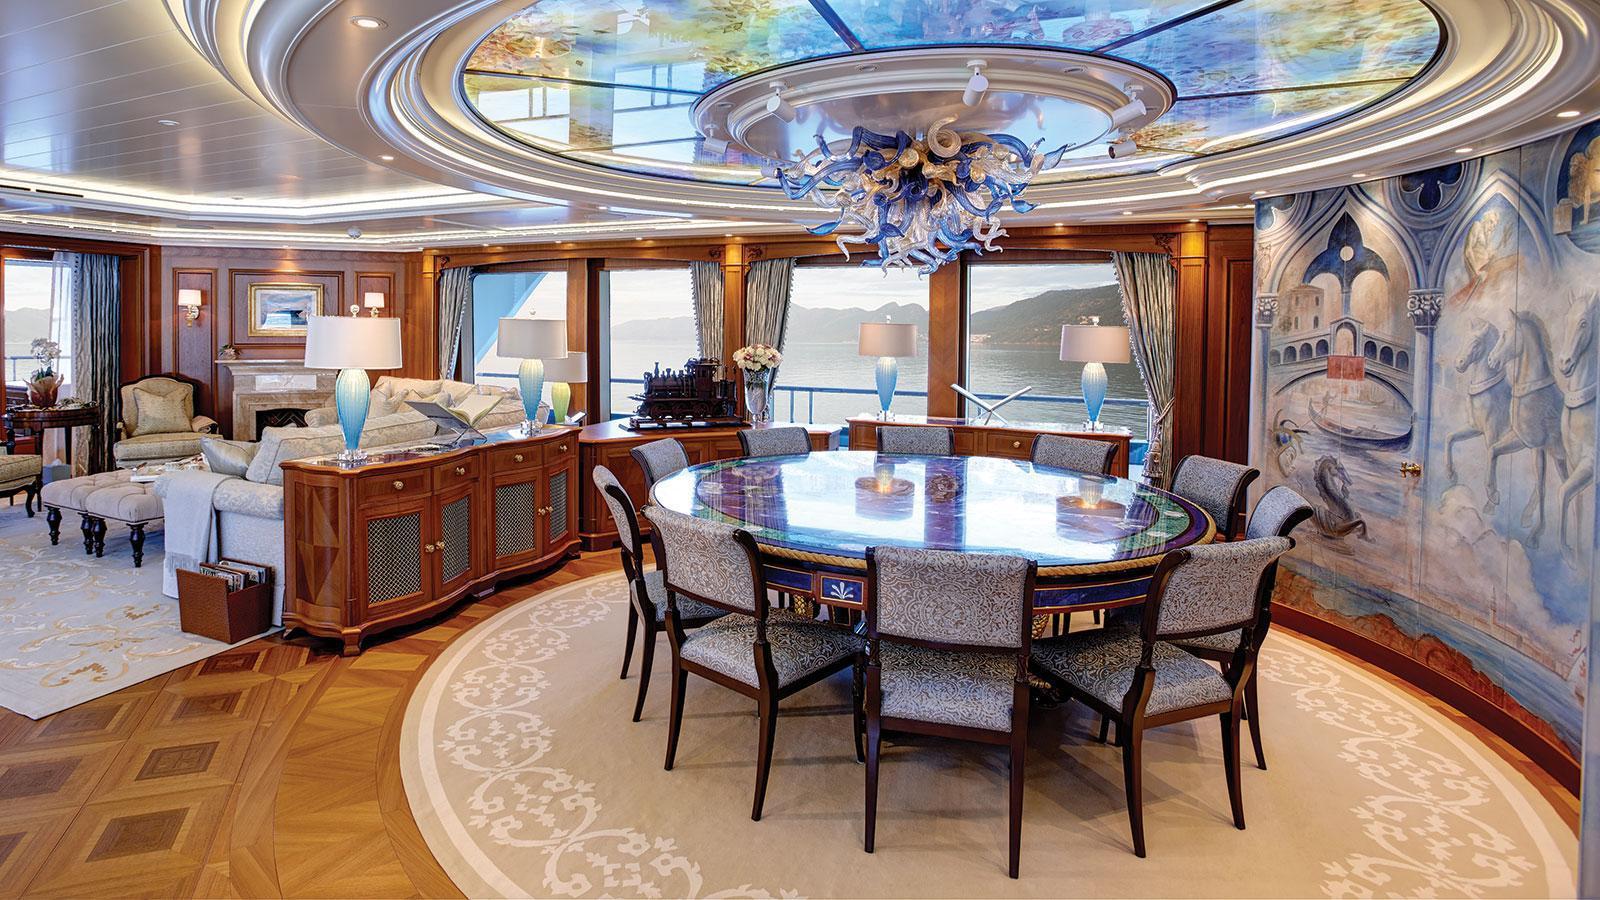 sea-owl-motor-yacht-feadship-2013-62m-main-saloon